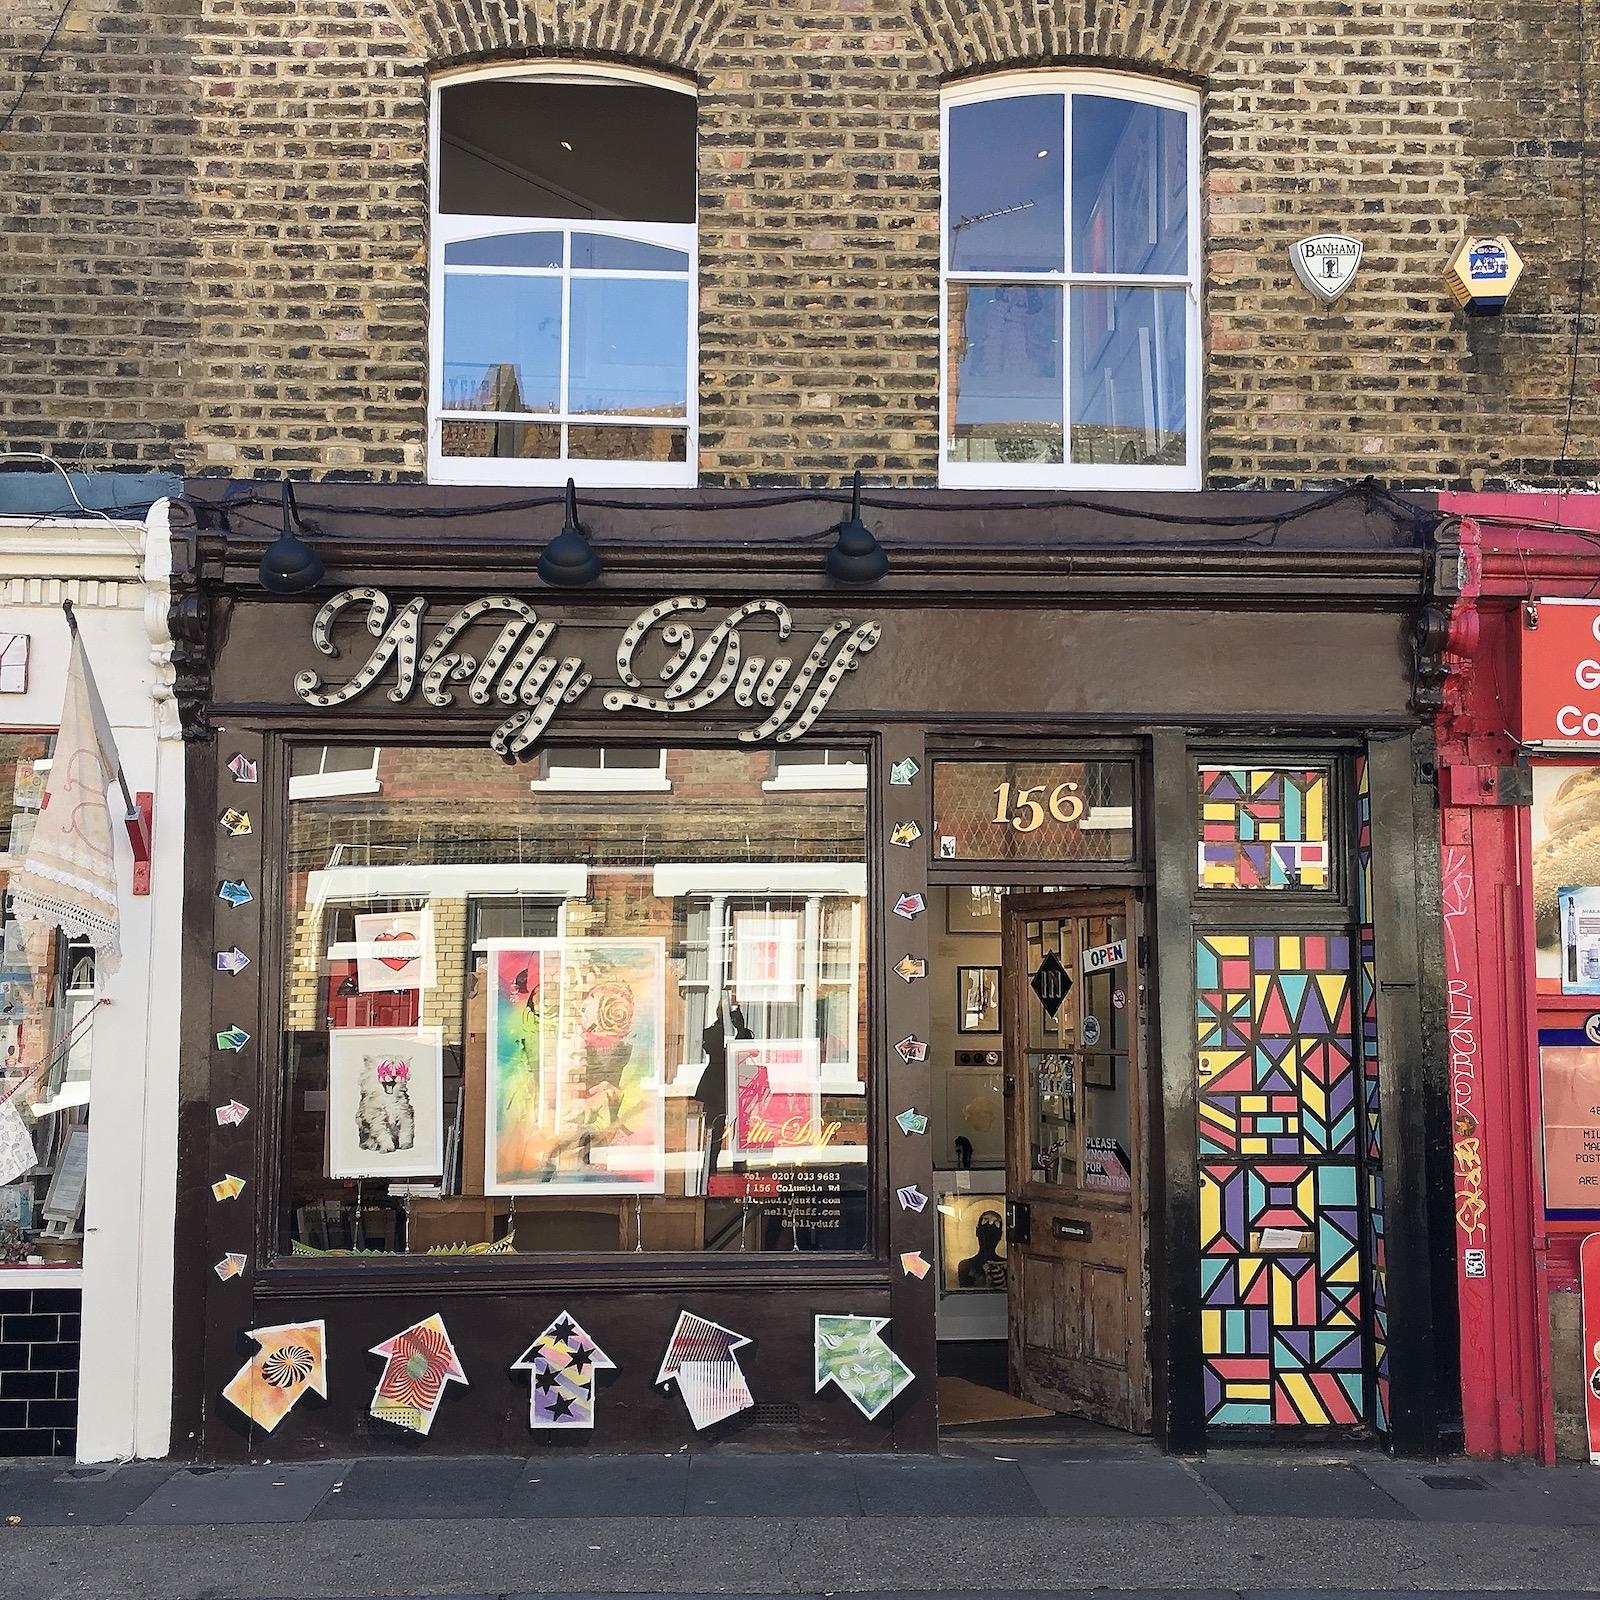 coole wanddeko kunstgalerie nelly duff in london sophiagaleria. Black Bedroom Furniture Sets. Home Design Ideas